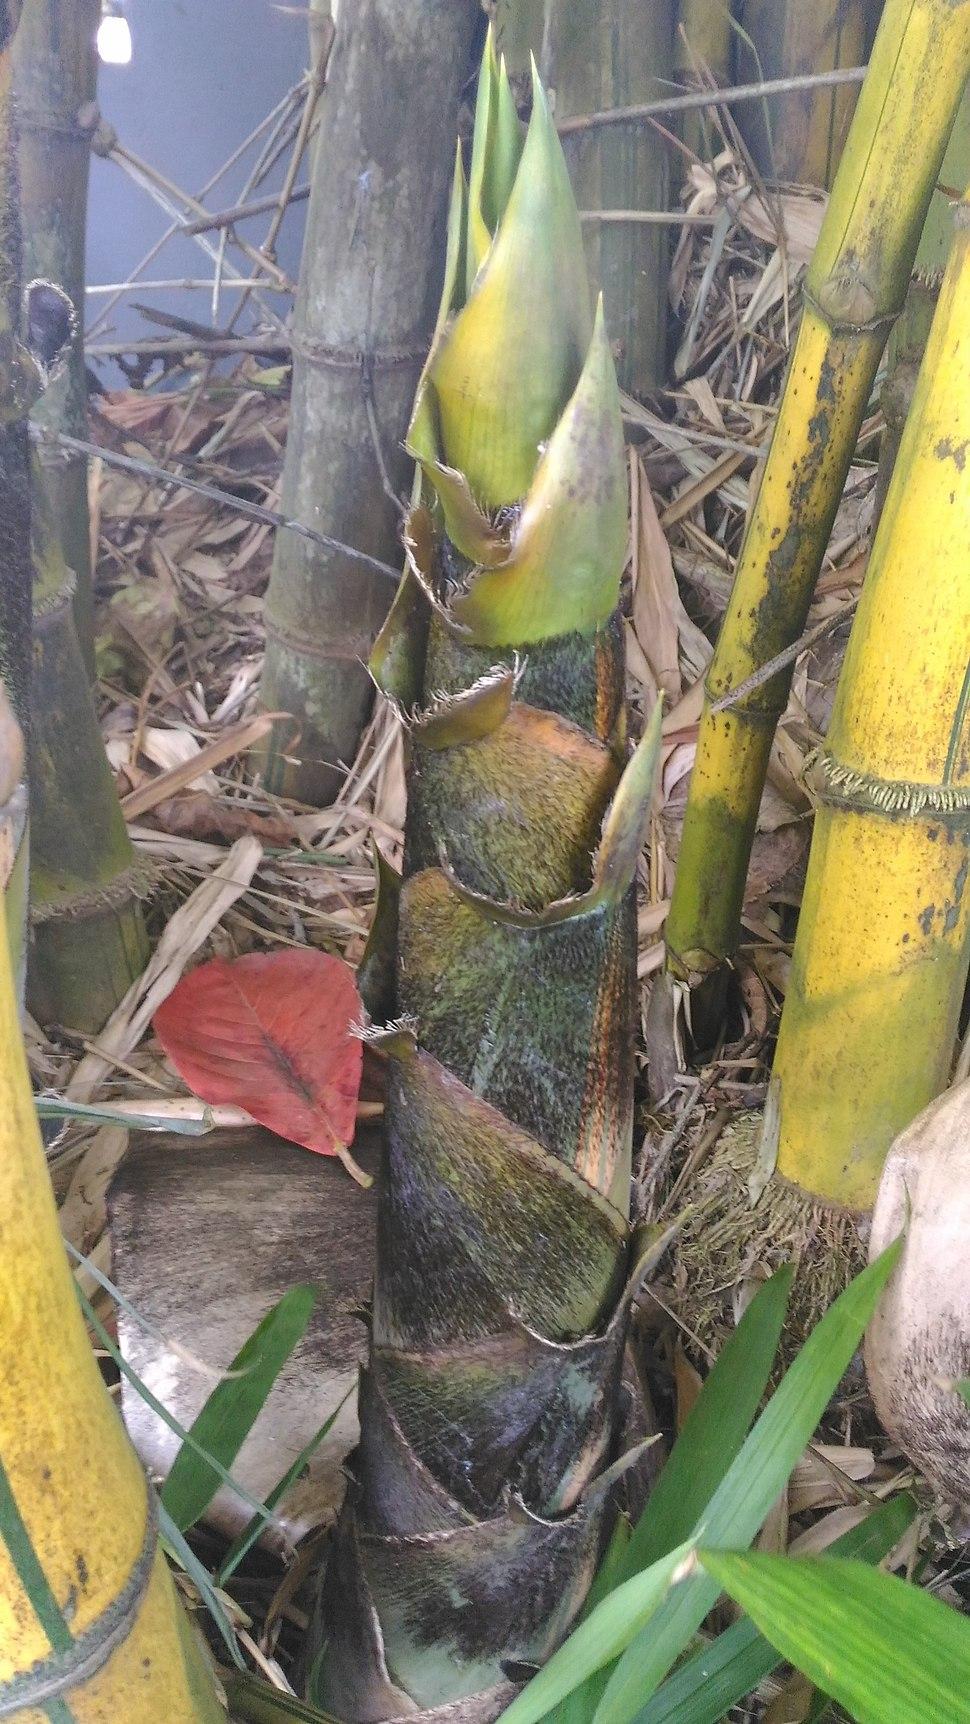 Bamboo seedling 02